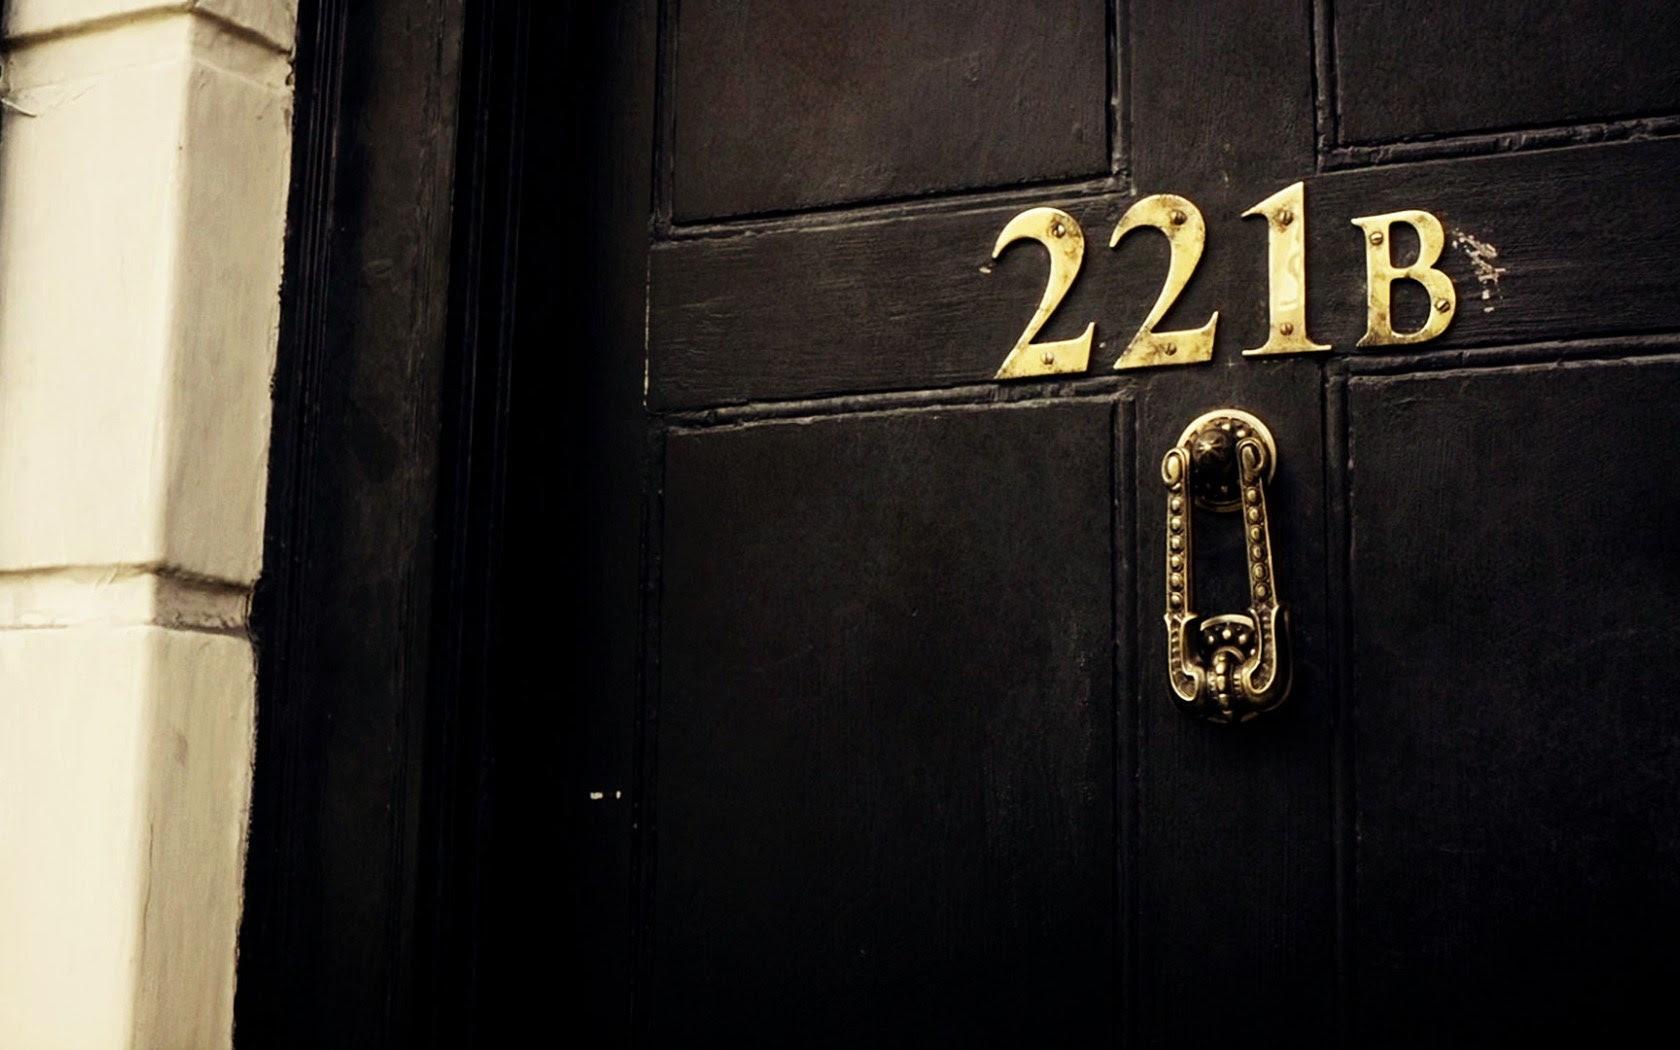 Sherlock 221b Baker Street Hd Wallpaper Wallpapers Moving